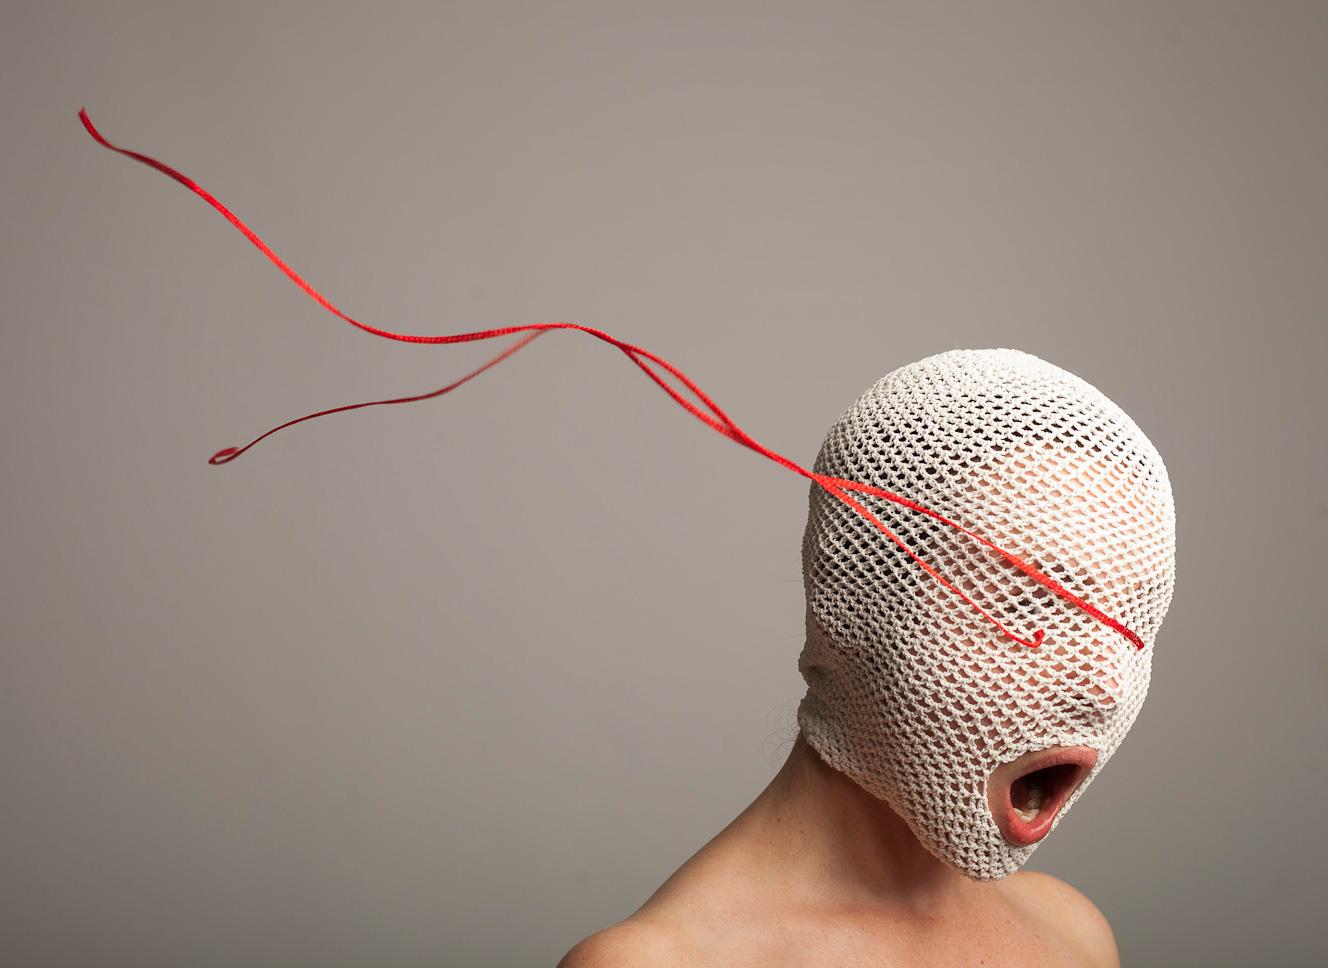 Pictoplasma 2020 - Visual Artist Threadstories